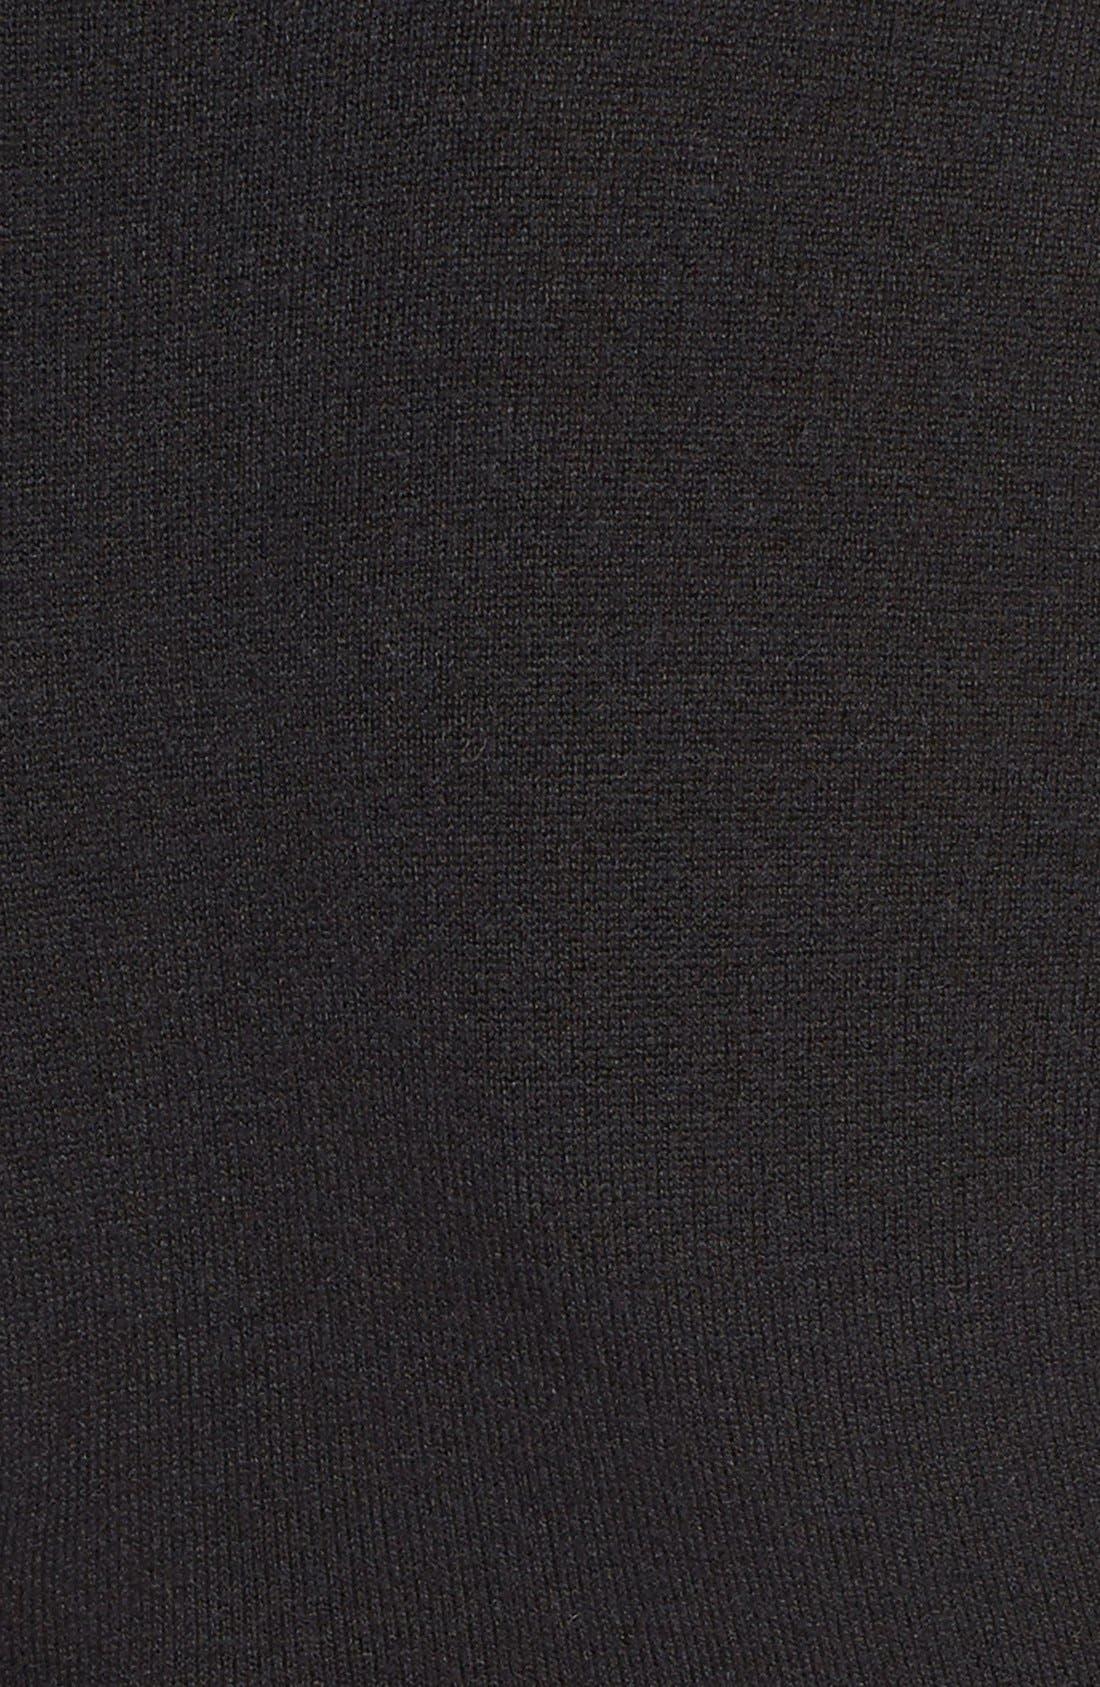 'Garrison' Mock Turtleneck,                             Alternate thumbnail 3, color,                             001